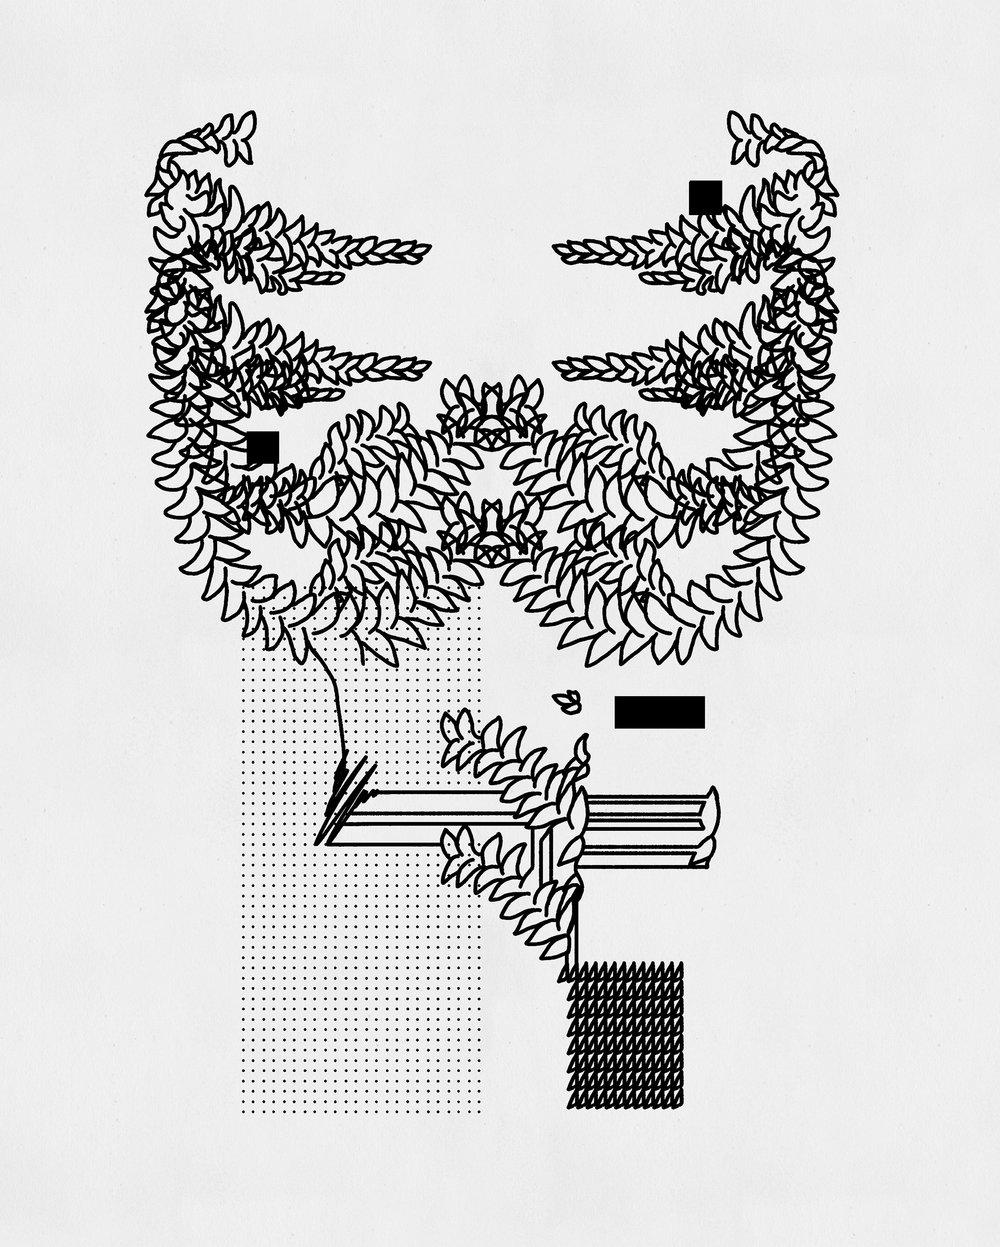 %22Minoría%22 - 25 x 20 cm - Fine art print sobre papel - Julián Brangold - 2018.jpg